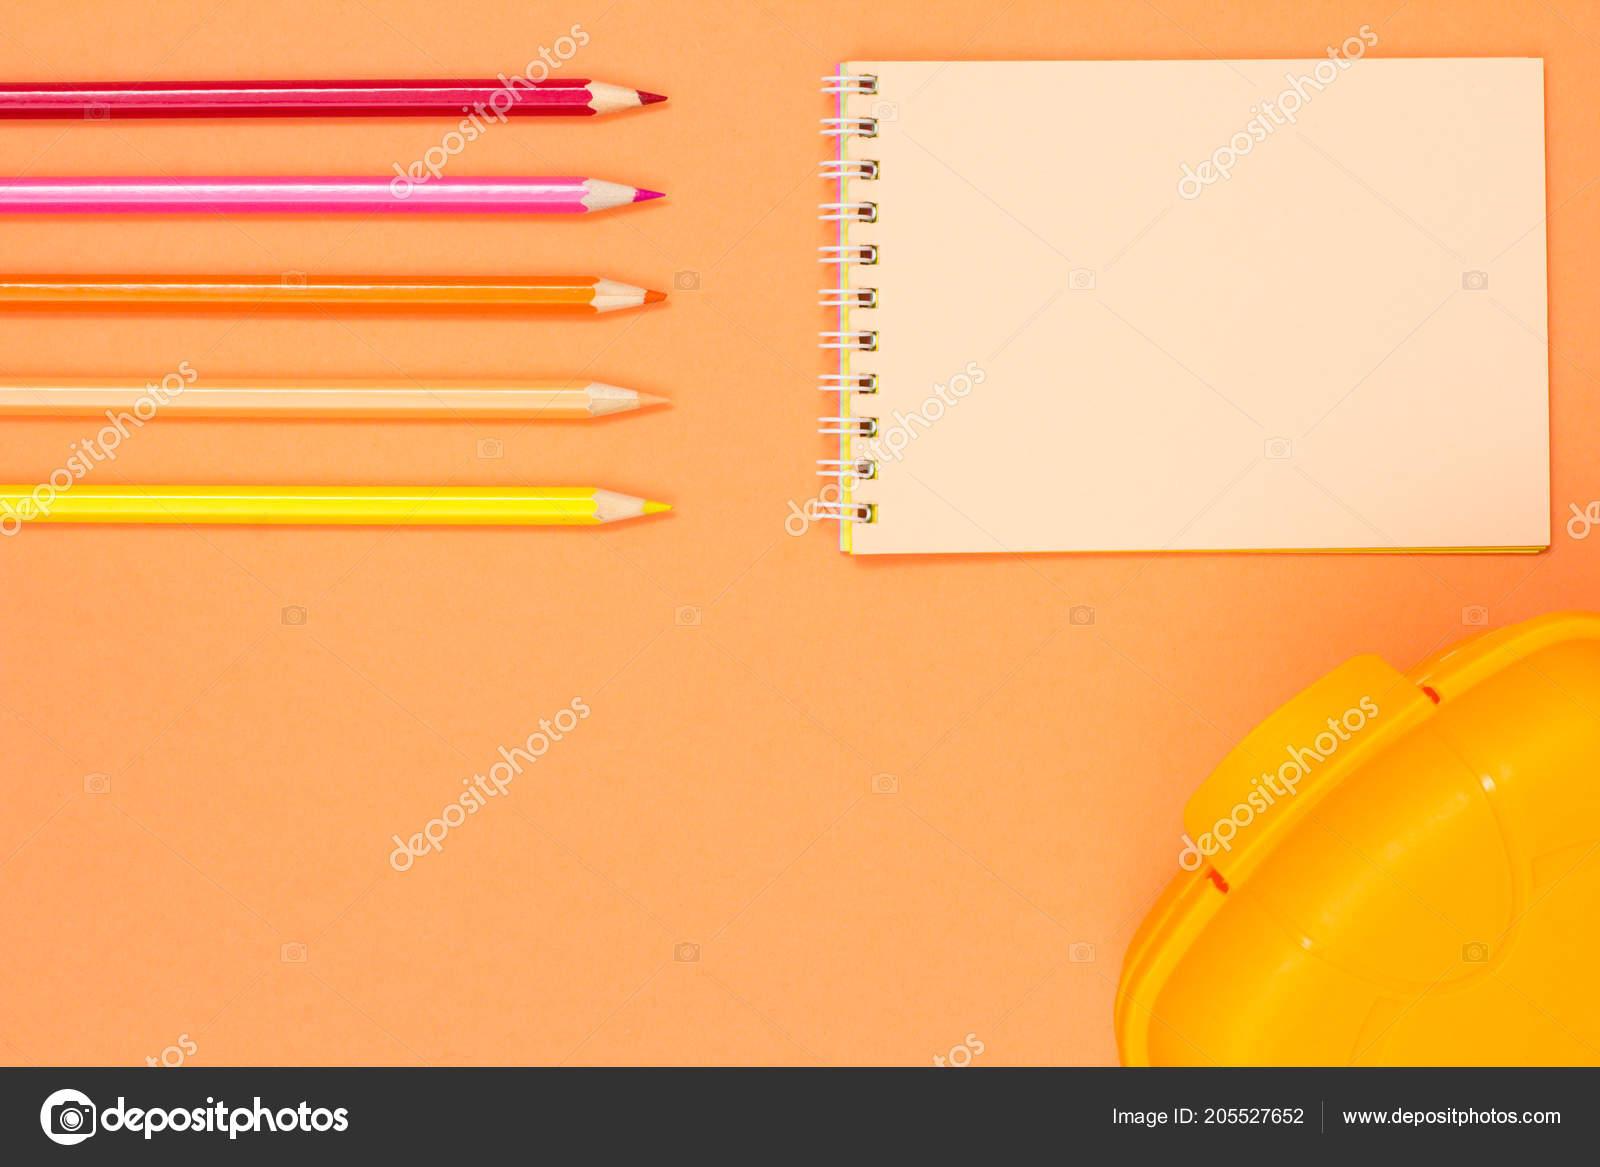 3c9ce7c00e5 Πίσω στο σχολείο έννοια. Σχολικά είδη. Παστέλ χρώματα– εικόνα αρχείου.  Μολύβια Χρώματος Σημειωματάριο Και Μεσημεριανό Γεύμα Κουτί Ροζ Φόντο Top —  Φωτογραφία ...